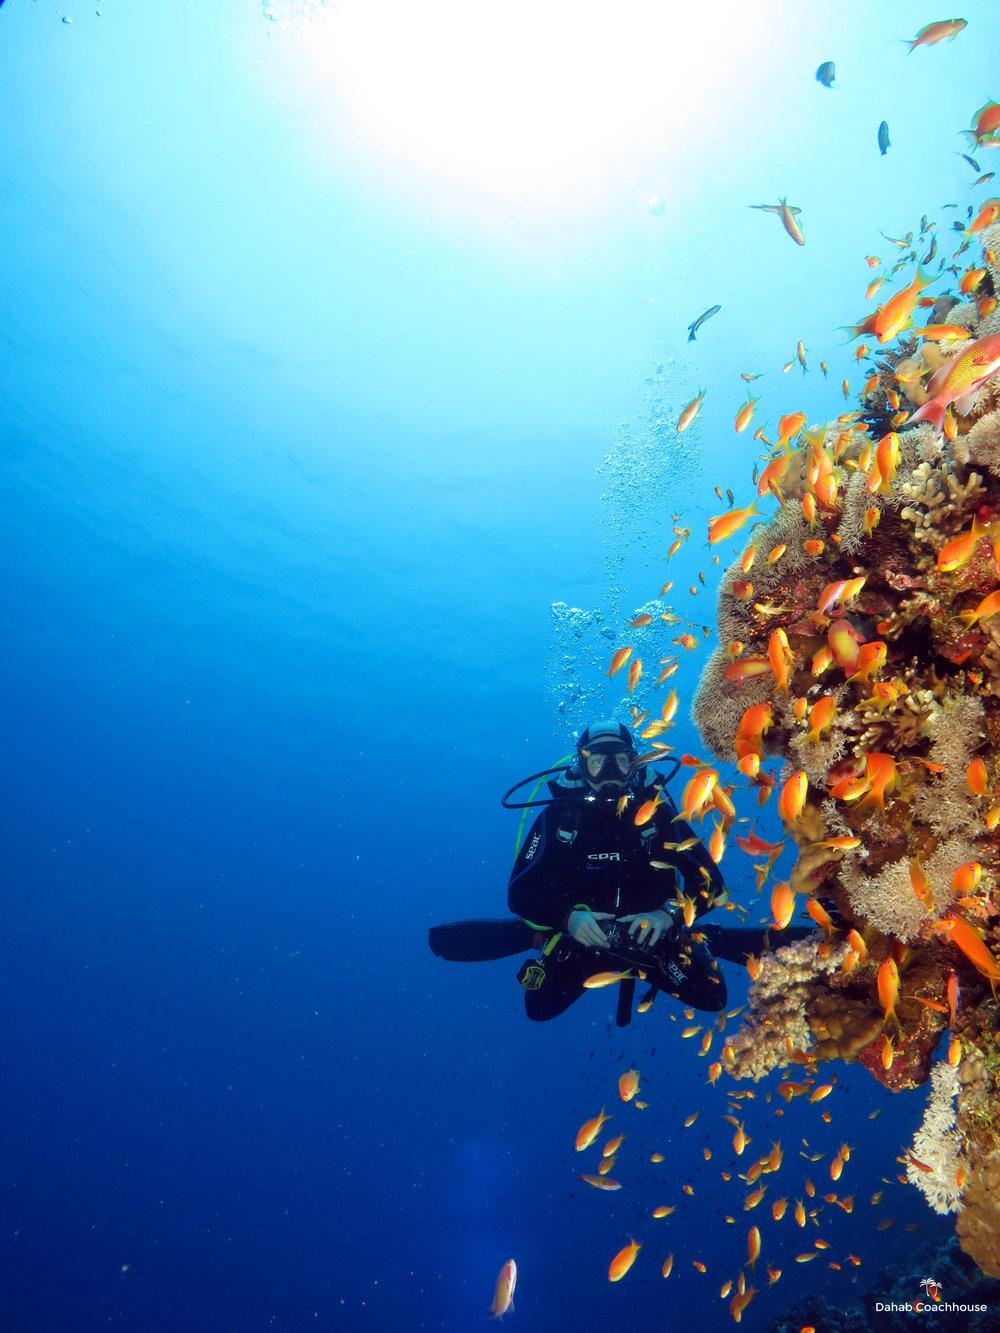 Dahab_Coachhouse_Egypt_Red_Sea_Diving_Beach_Accommodation_Holiday_Travel_Diver.JPG